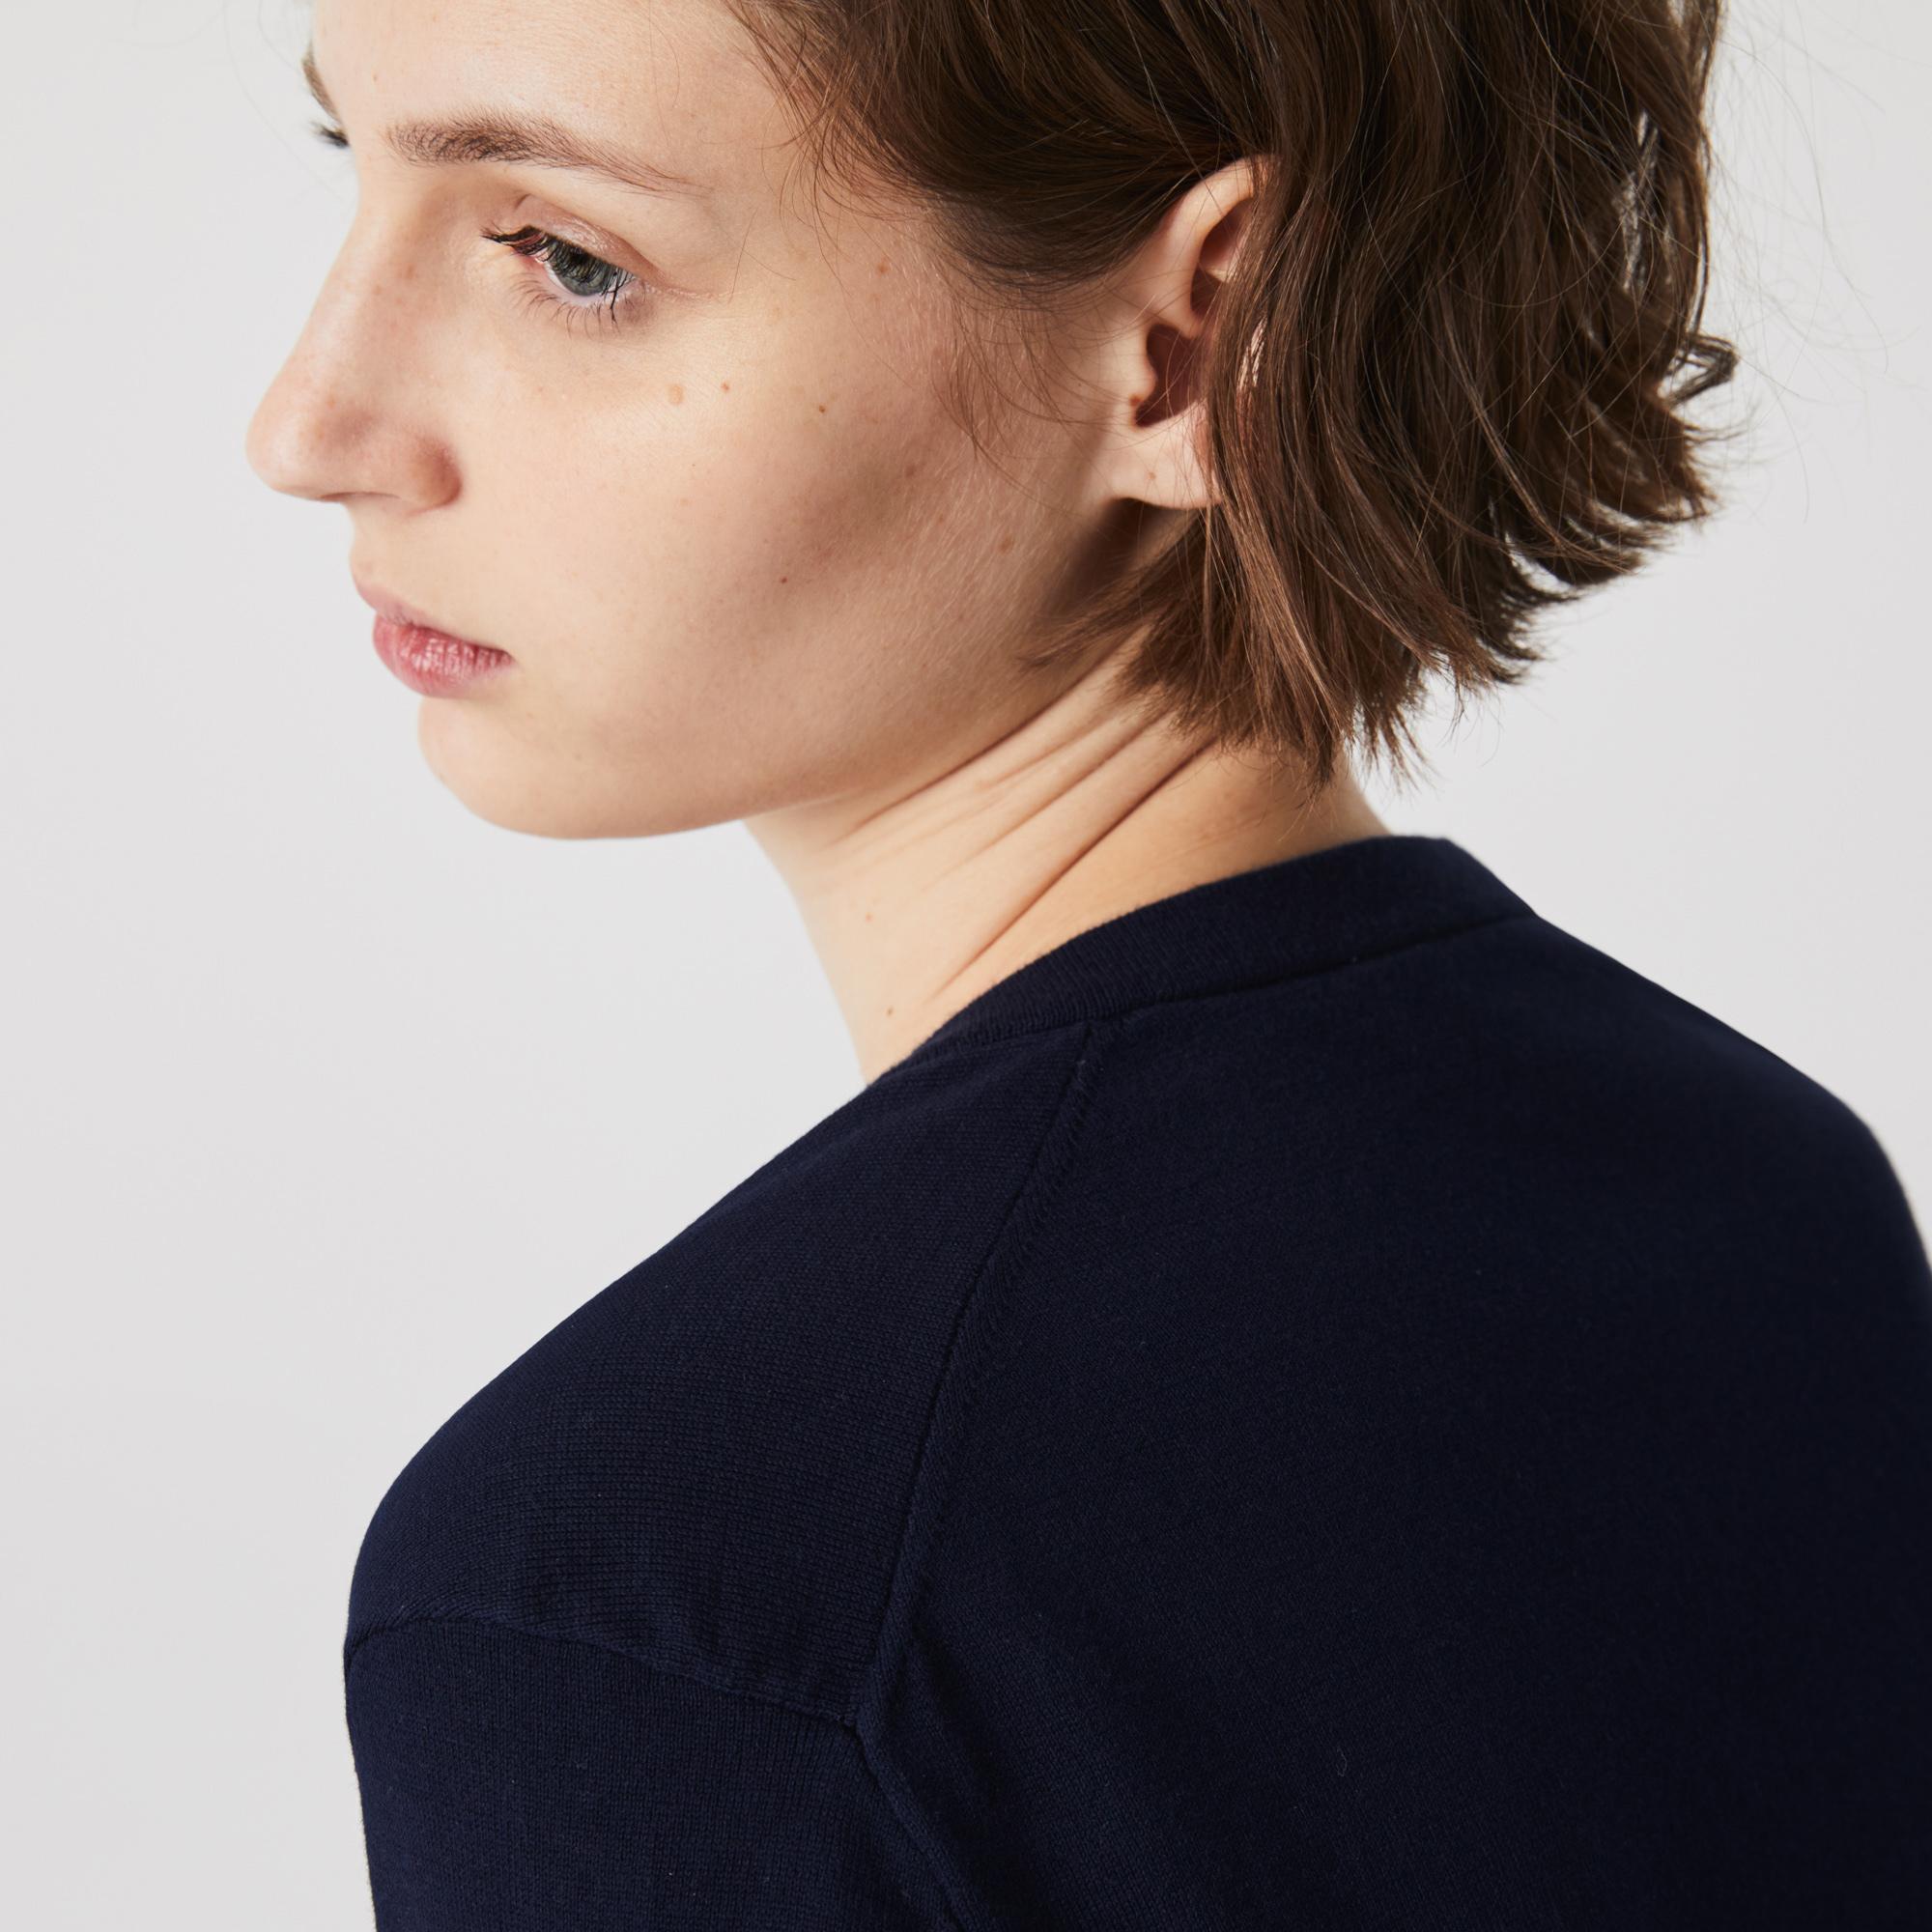 Lacoste Women?s V-neck Loose Organic Cotton Sweater